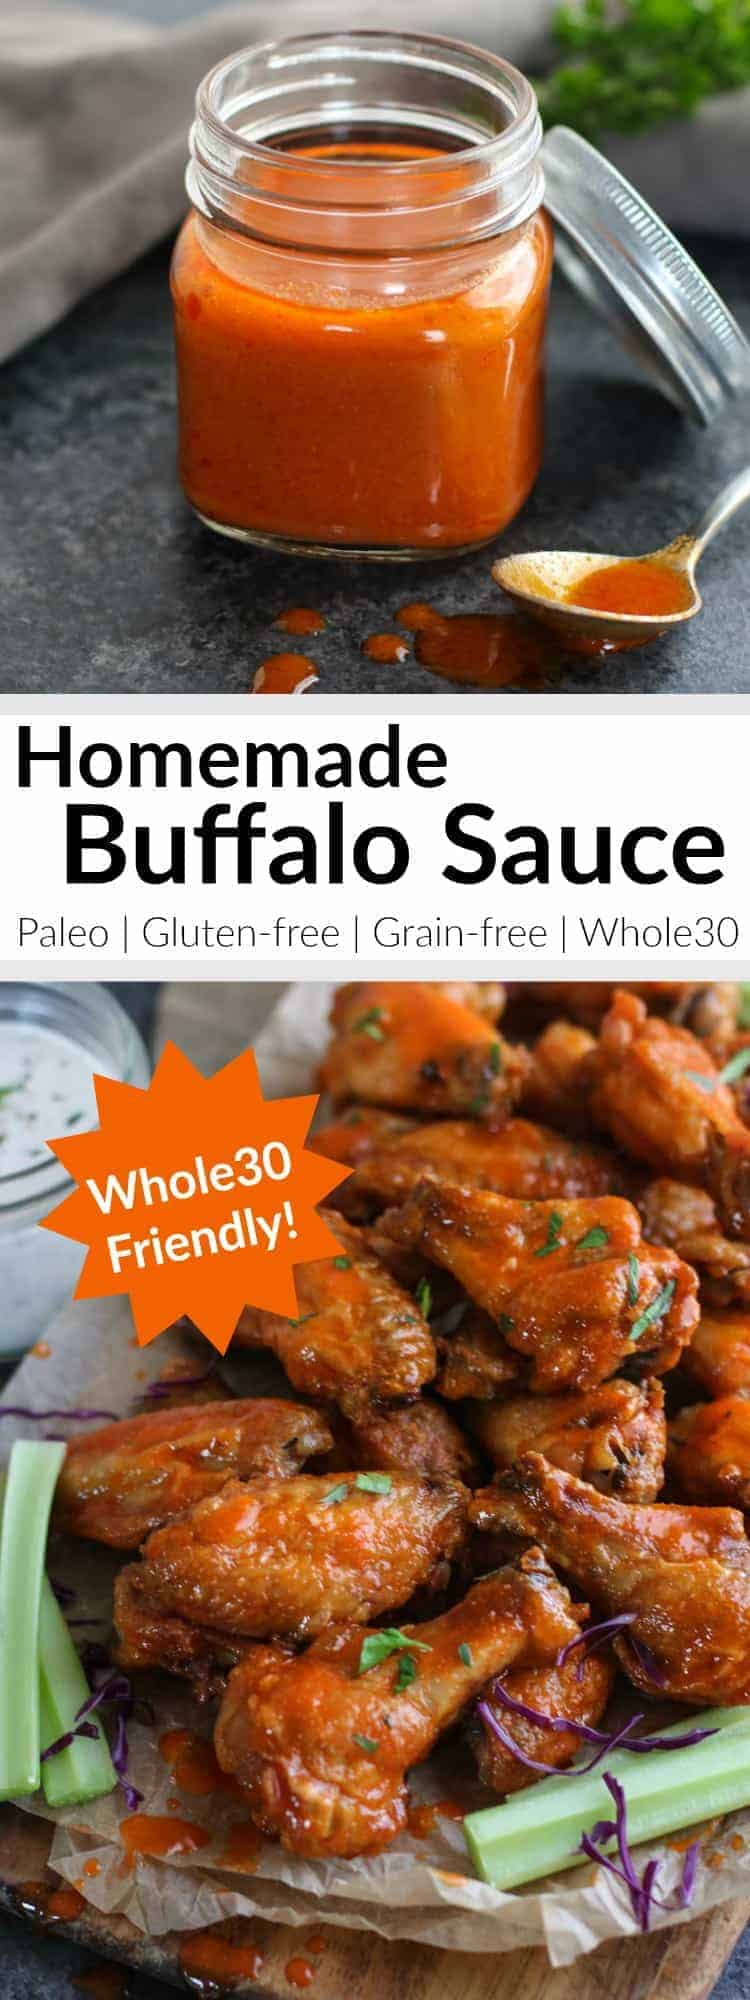 Pinterest image for Whole30 Homemade Buffalo Sauce